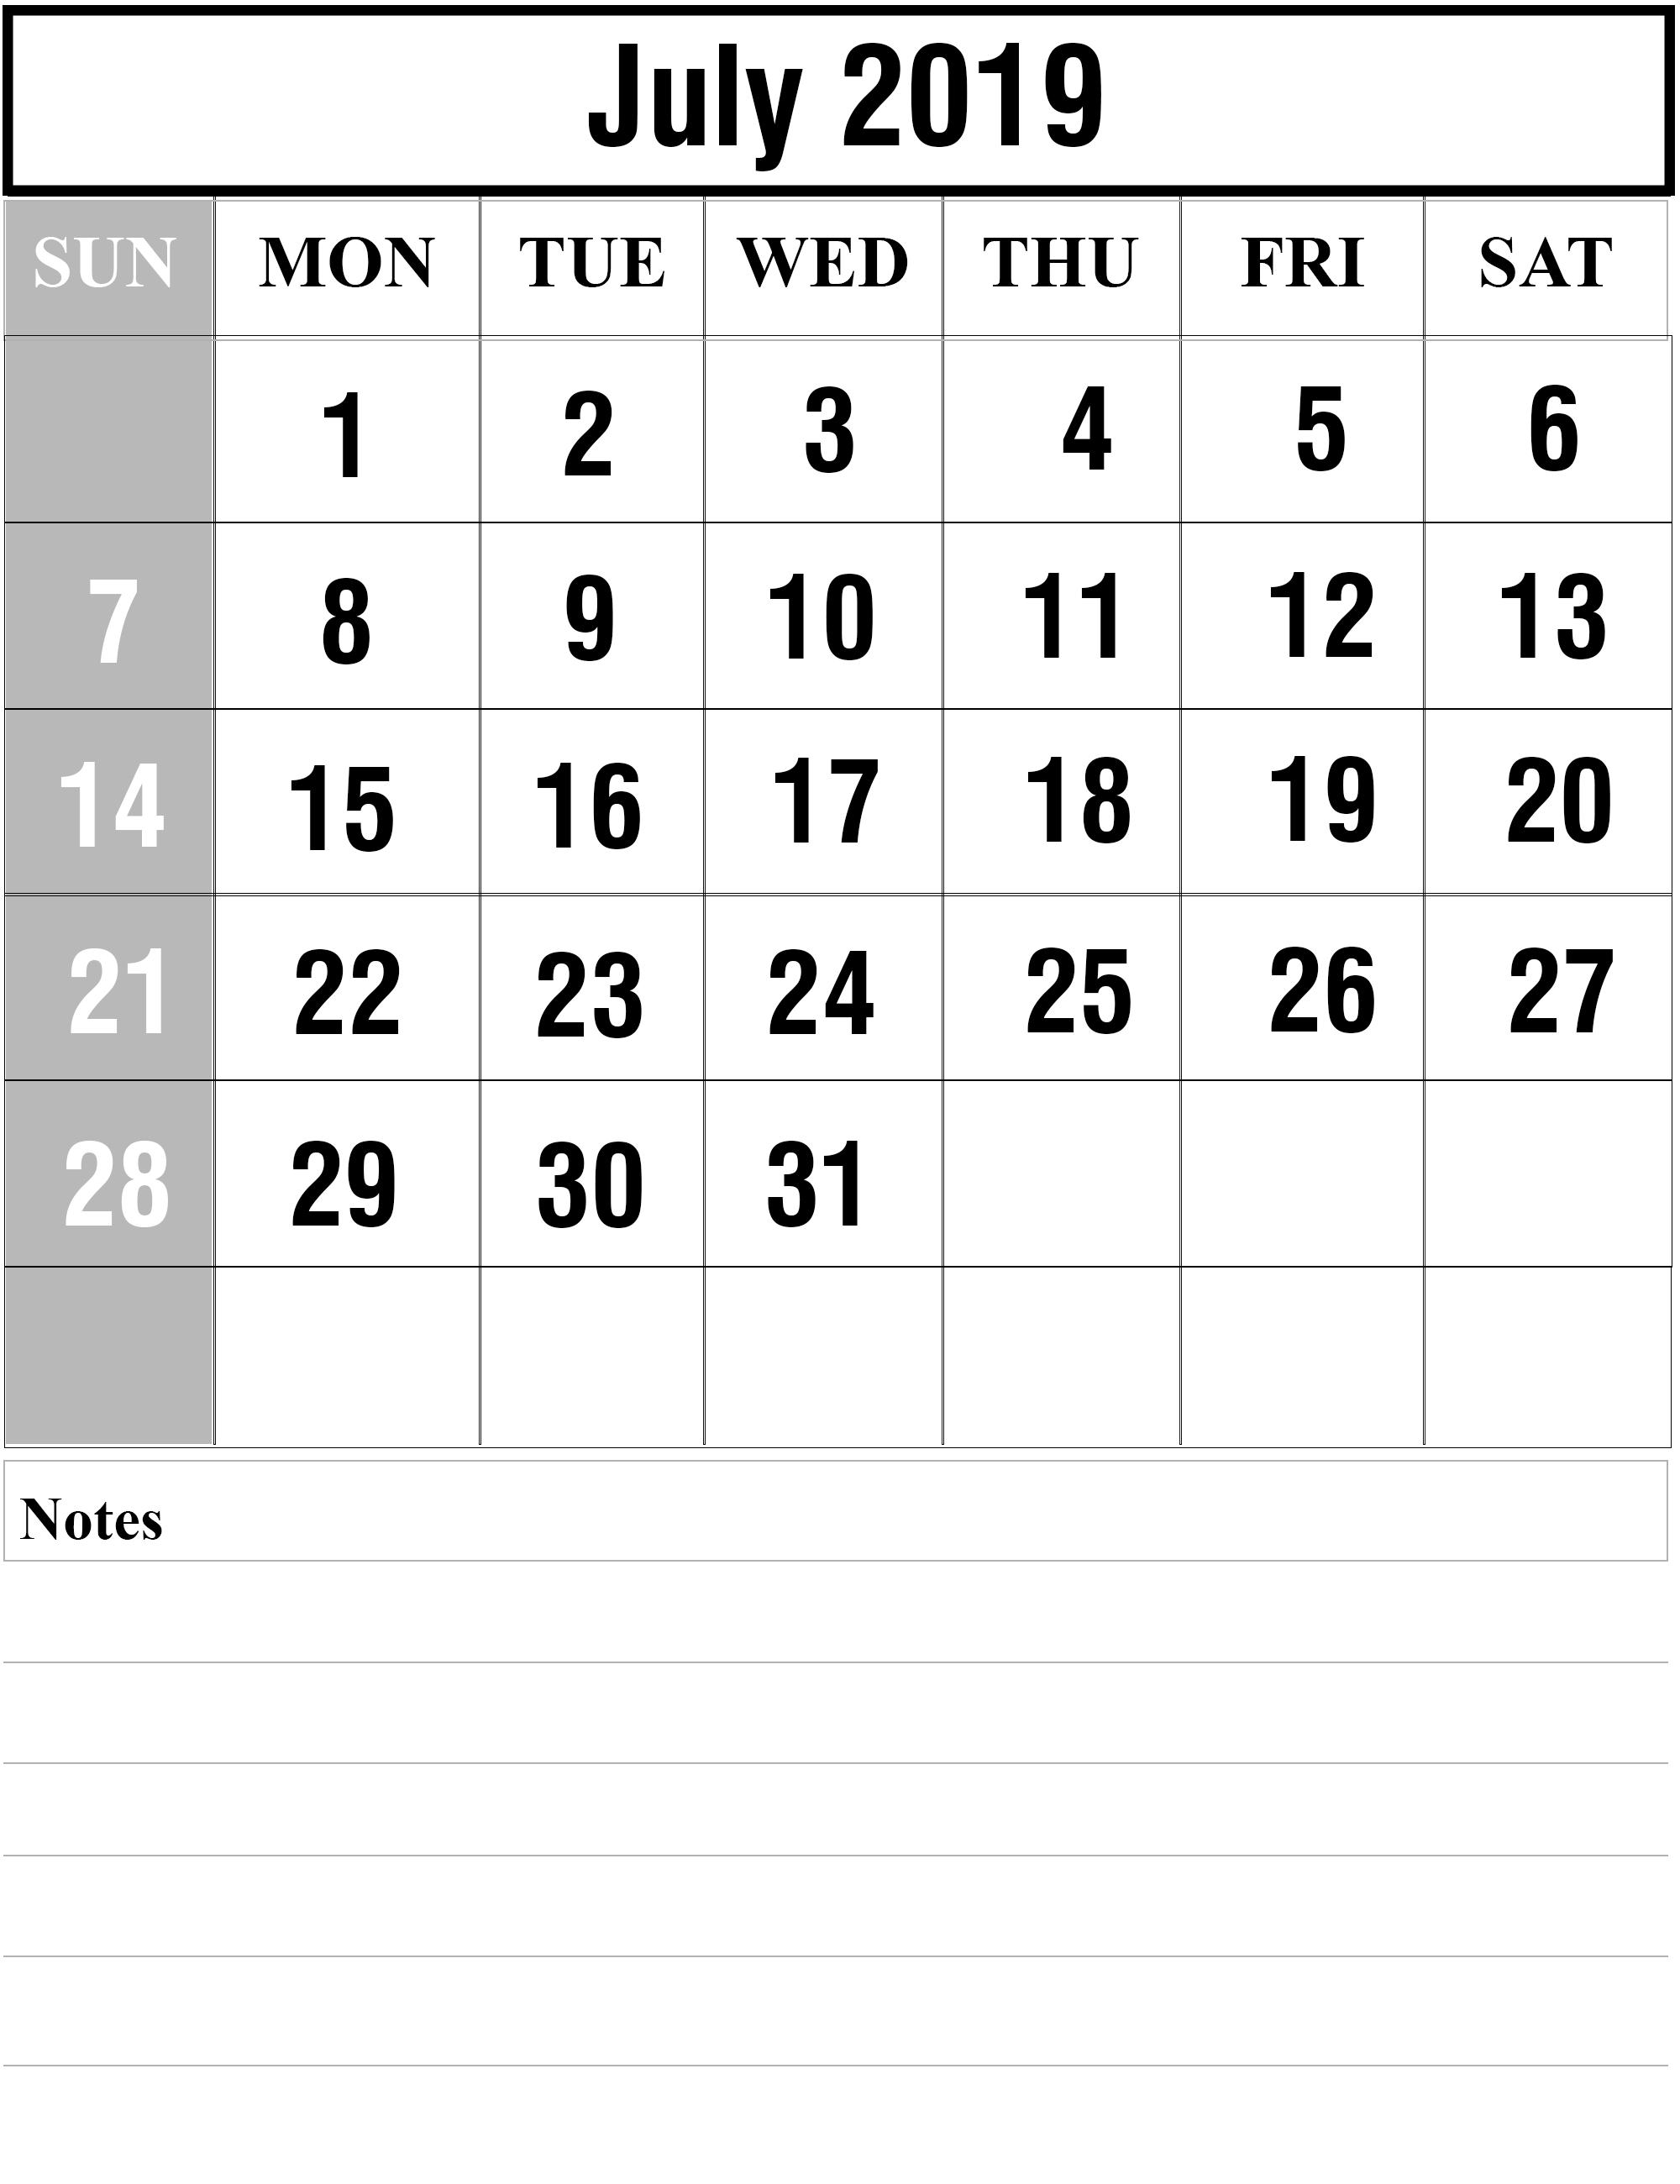 July 2019 Calendar Blank Template